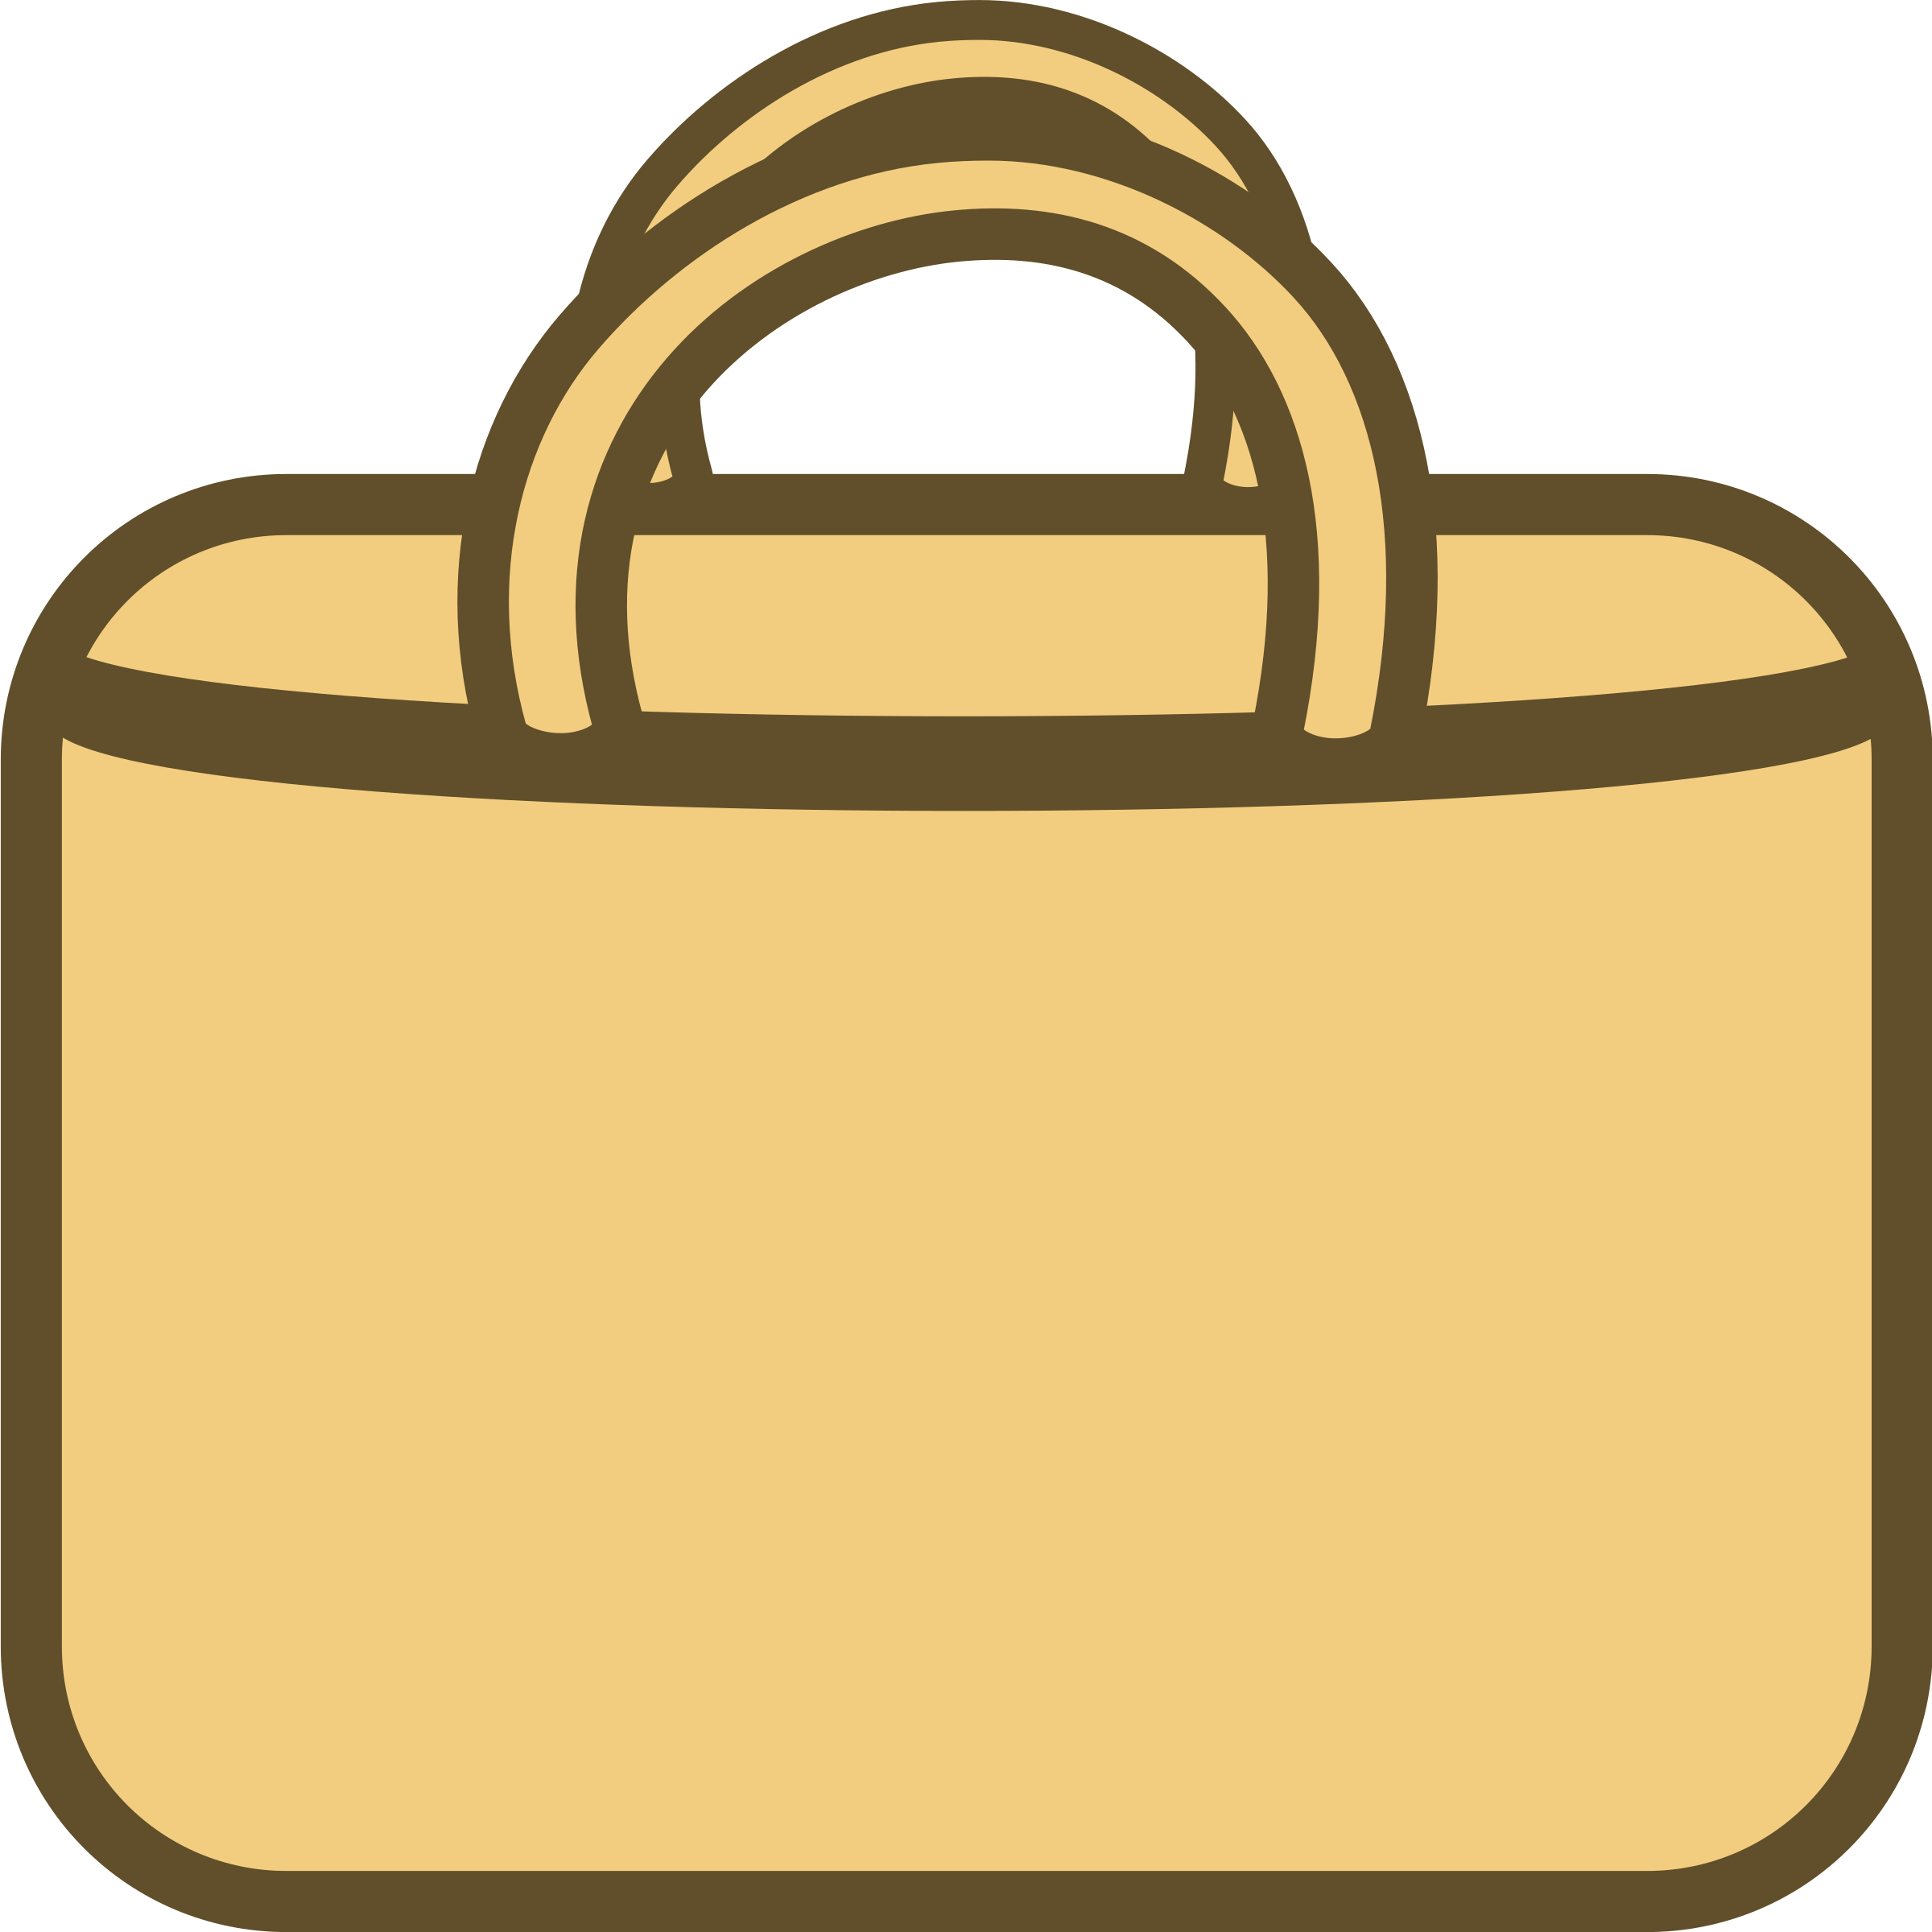 Simple shopping bag logo. Luggage clipart orange